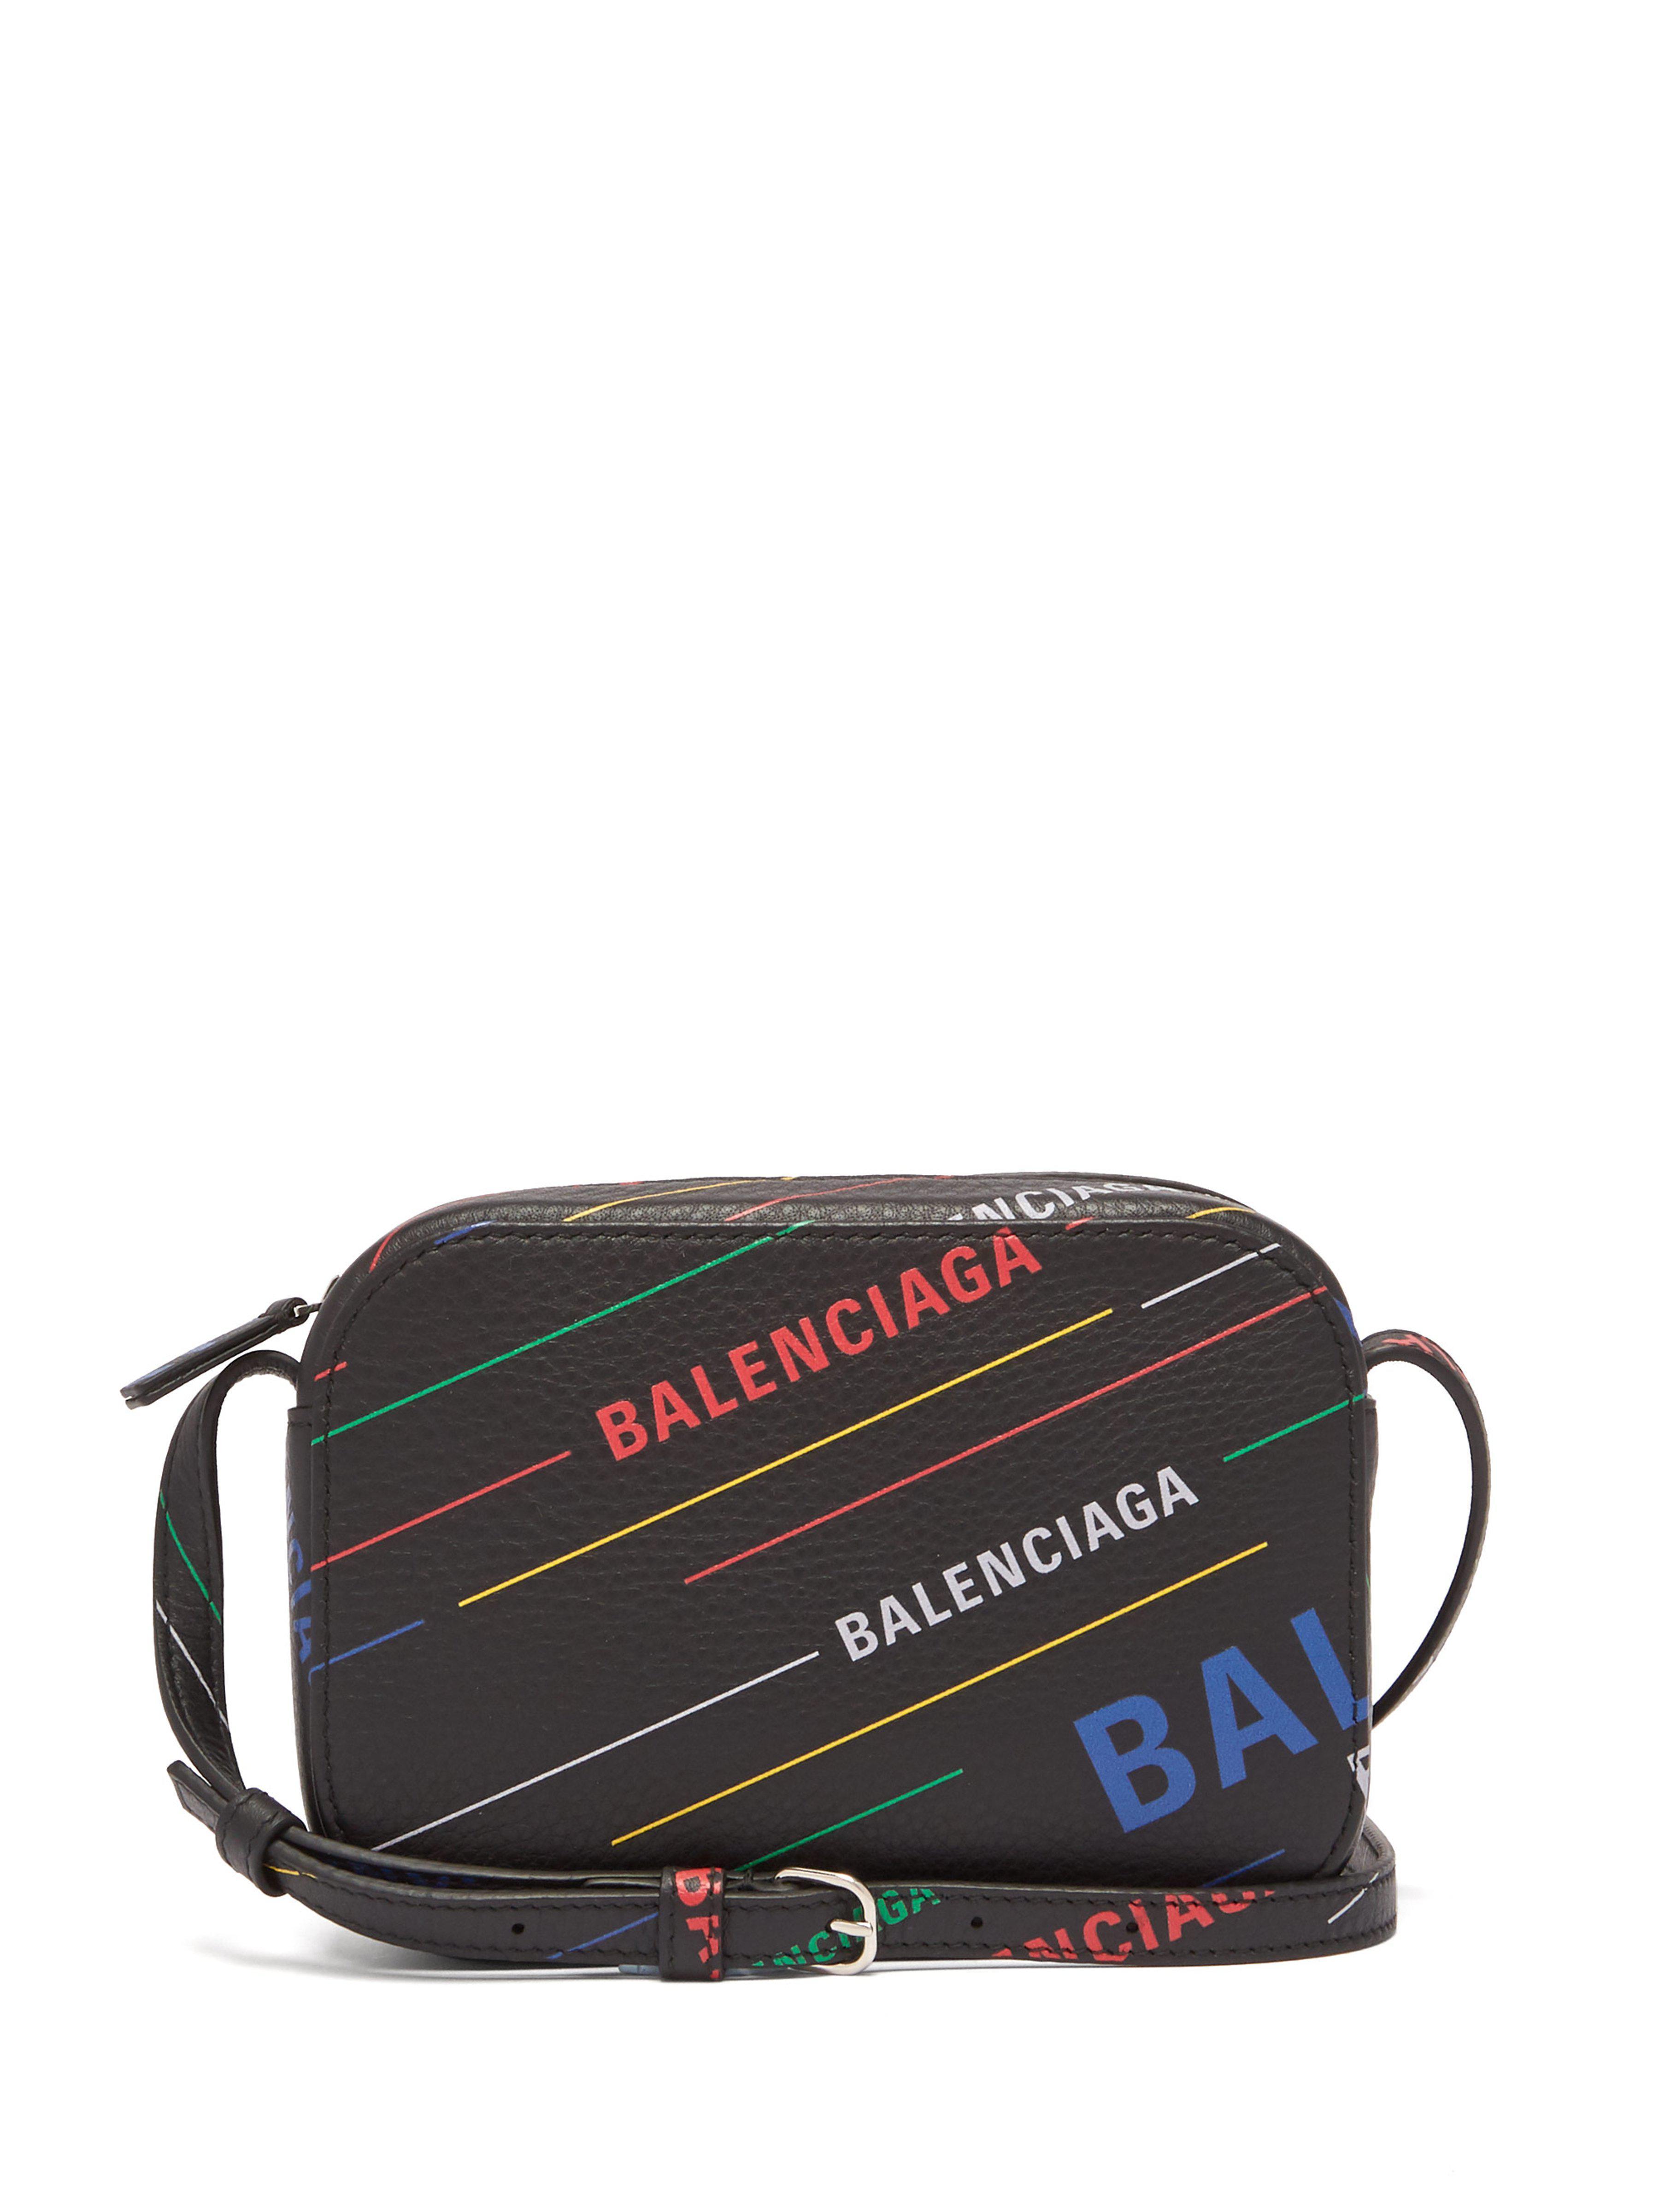 0e61609aa0c3 Balenciaga Everyday Xs Leather Cross Body Bag in Black - Lyst